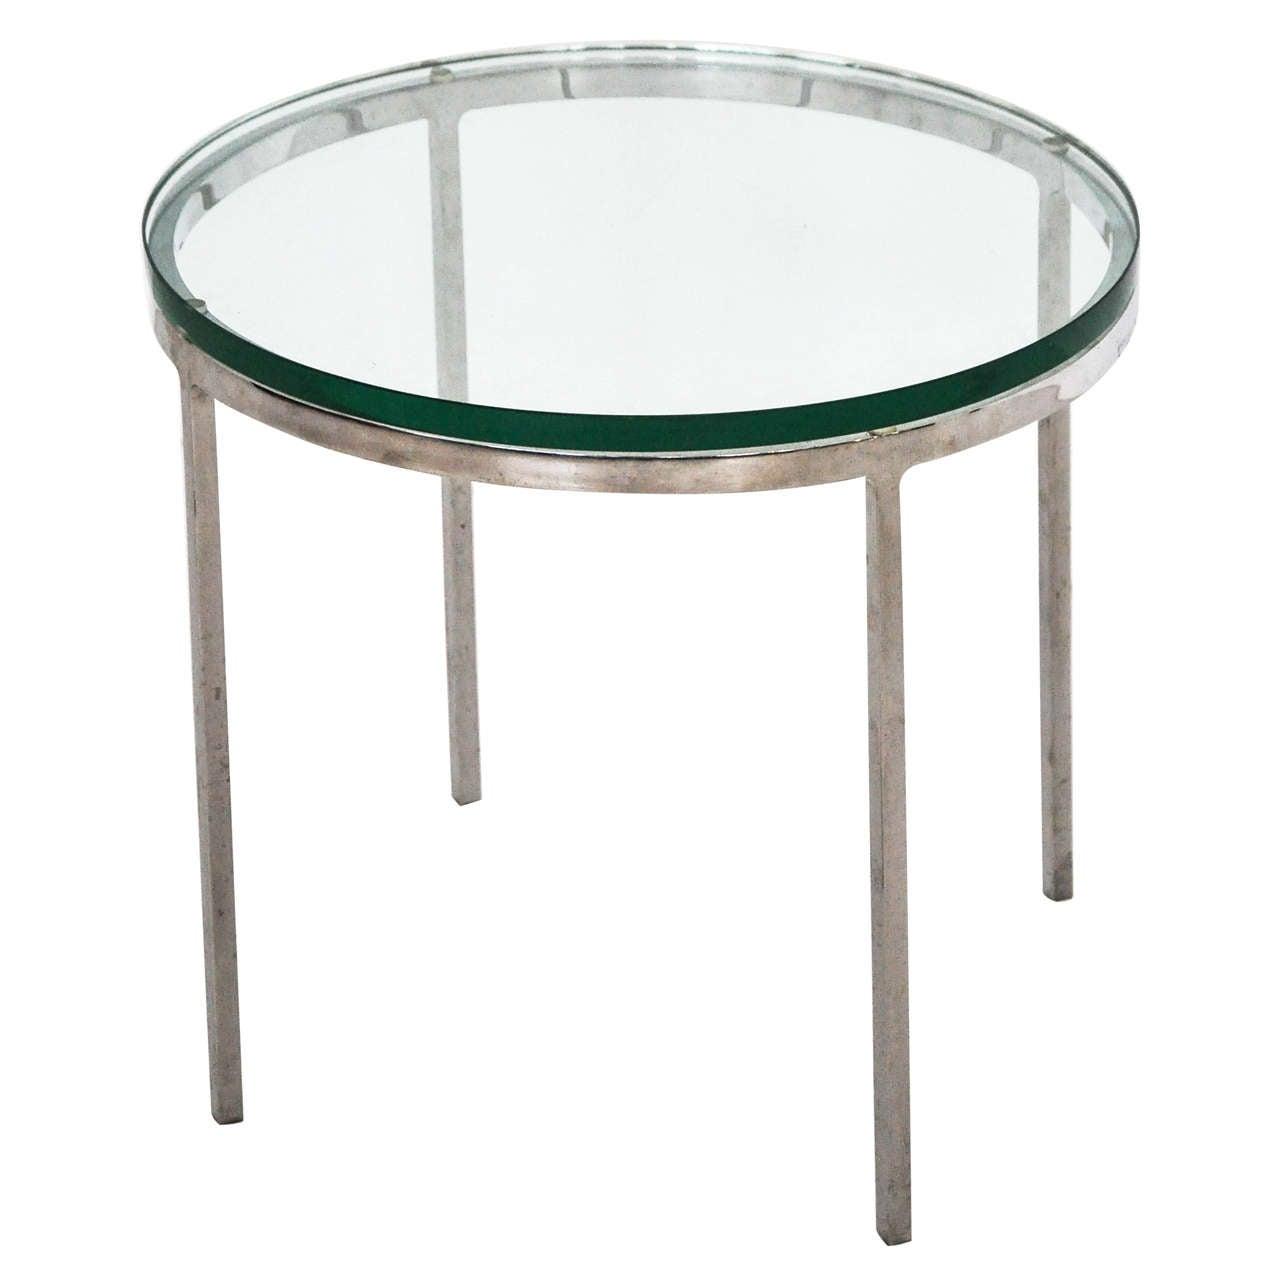 60 Mid Century Modern Vintage Half Moon Coffee Table: Nicos Zographos Chrome And Glass Side Table At 1stdibs